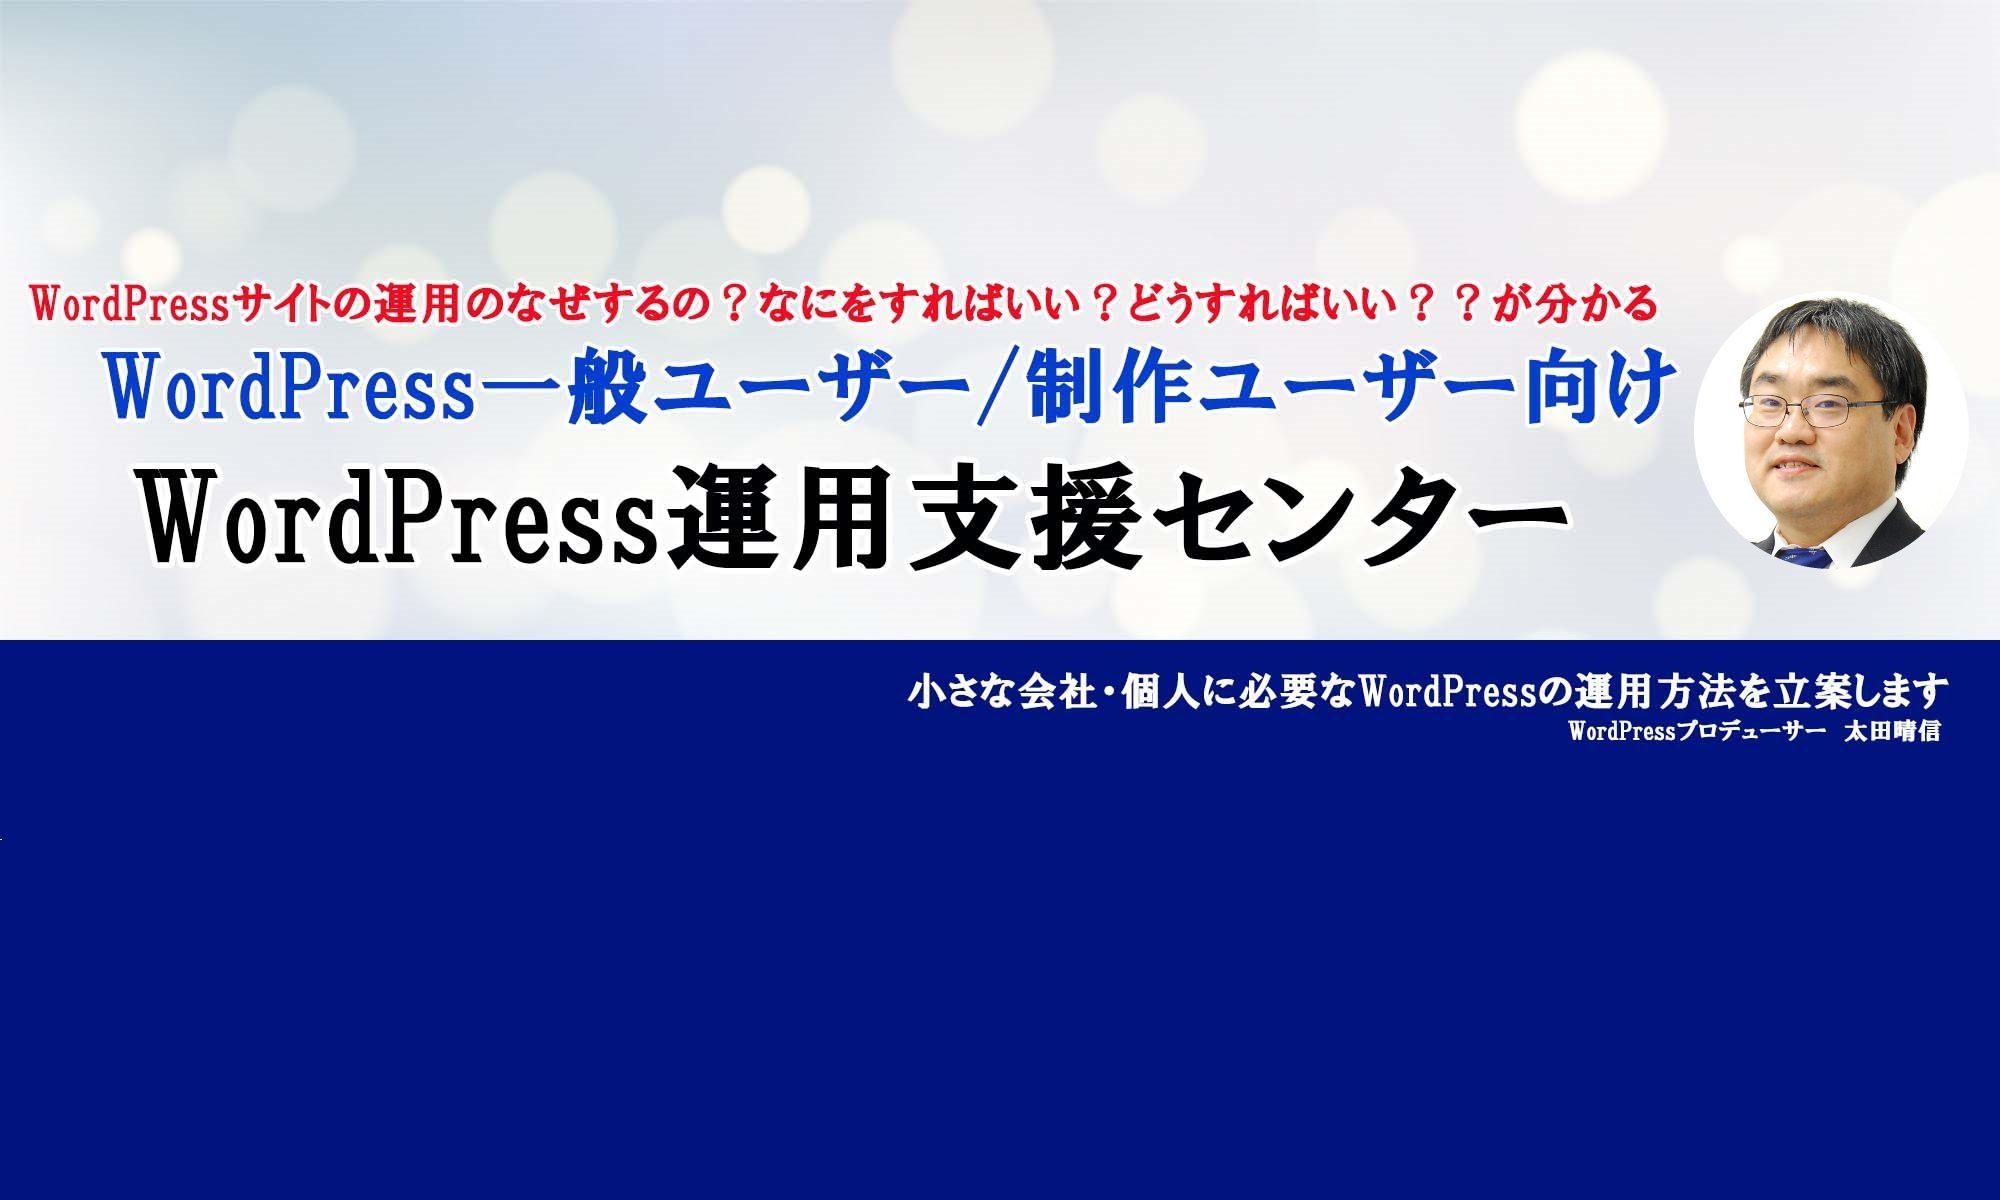 WordPress運用支援センター